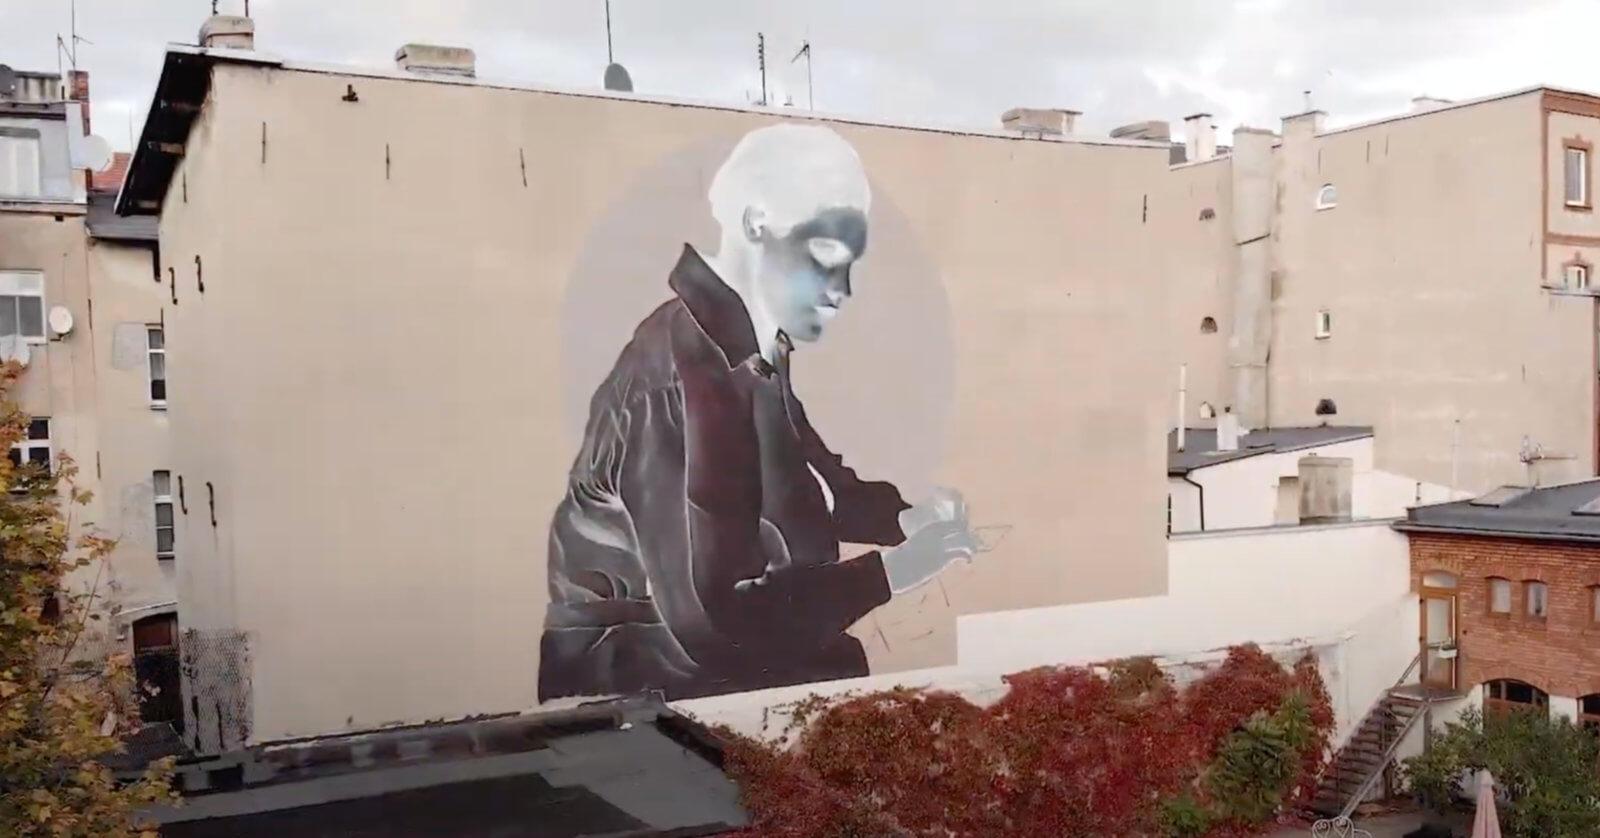 Mural Jadwigi Szopieraj